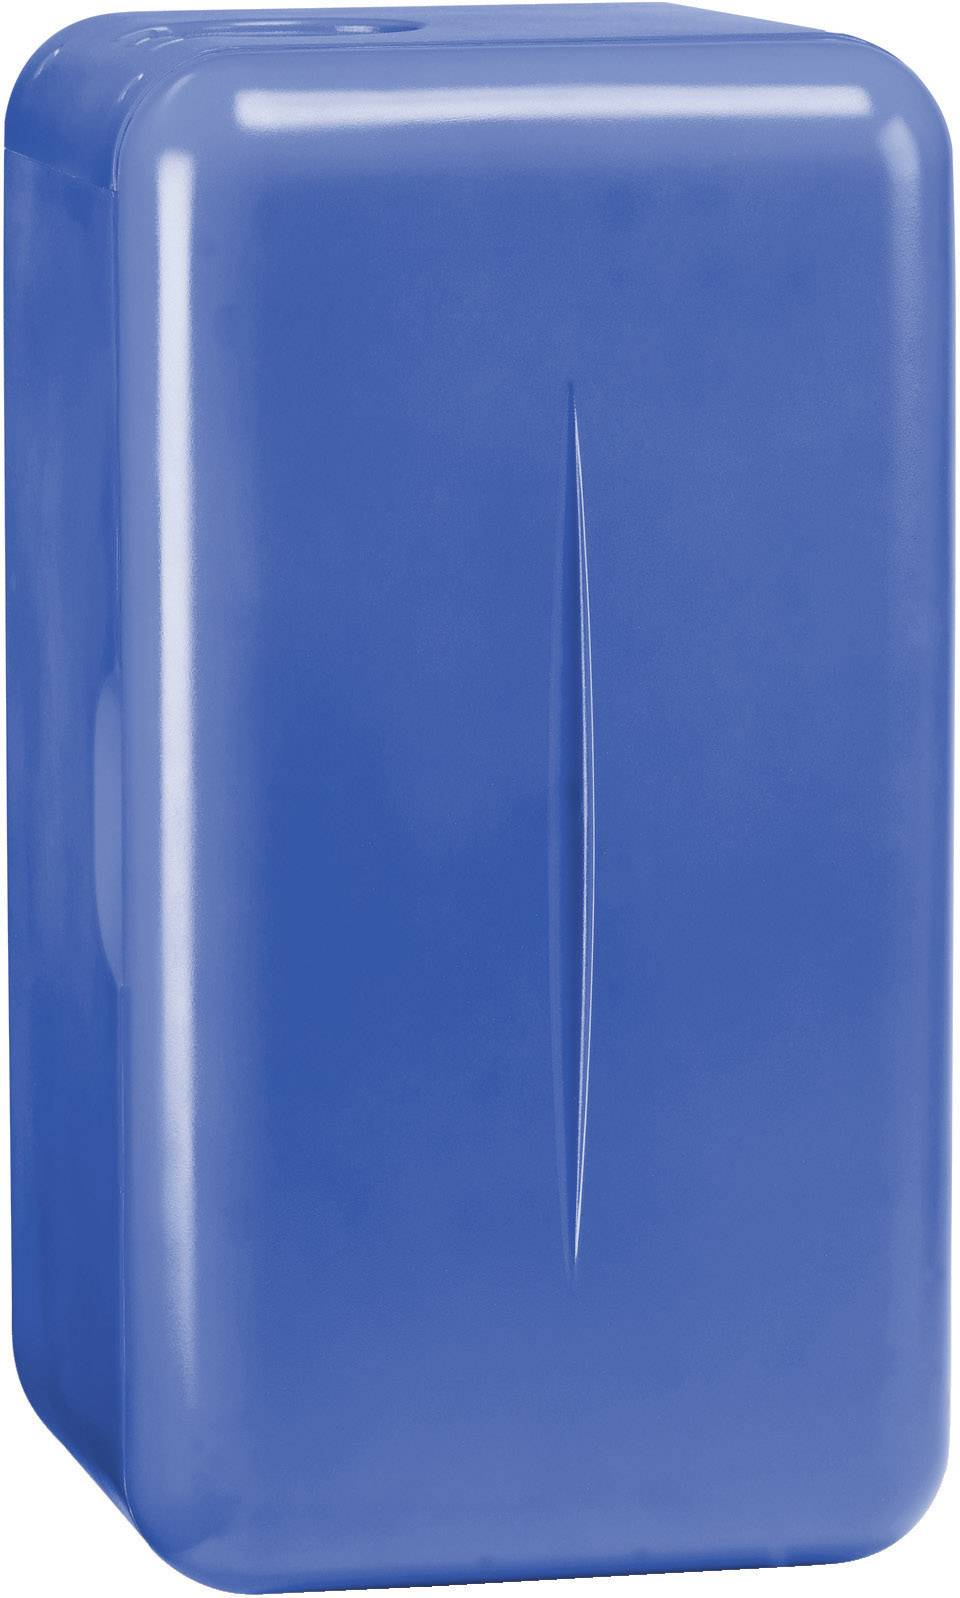 Mini chladnička / party chladicí box MobiCool F16 230 V modrá 14 l A++